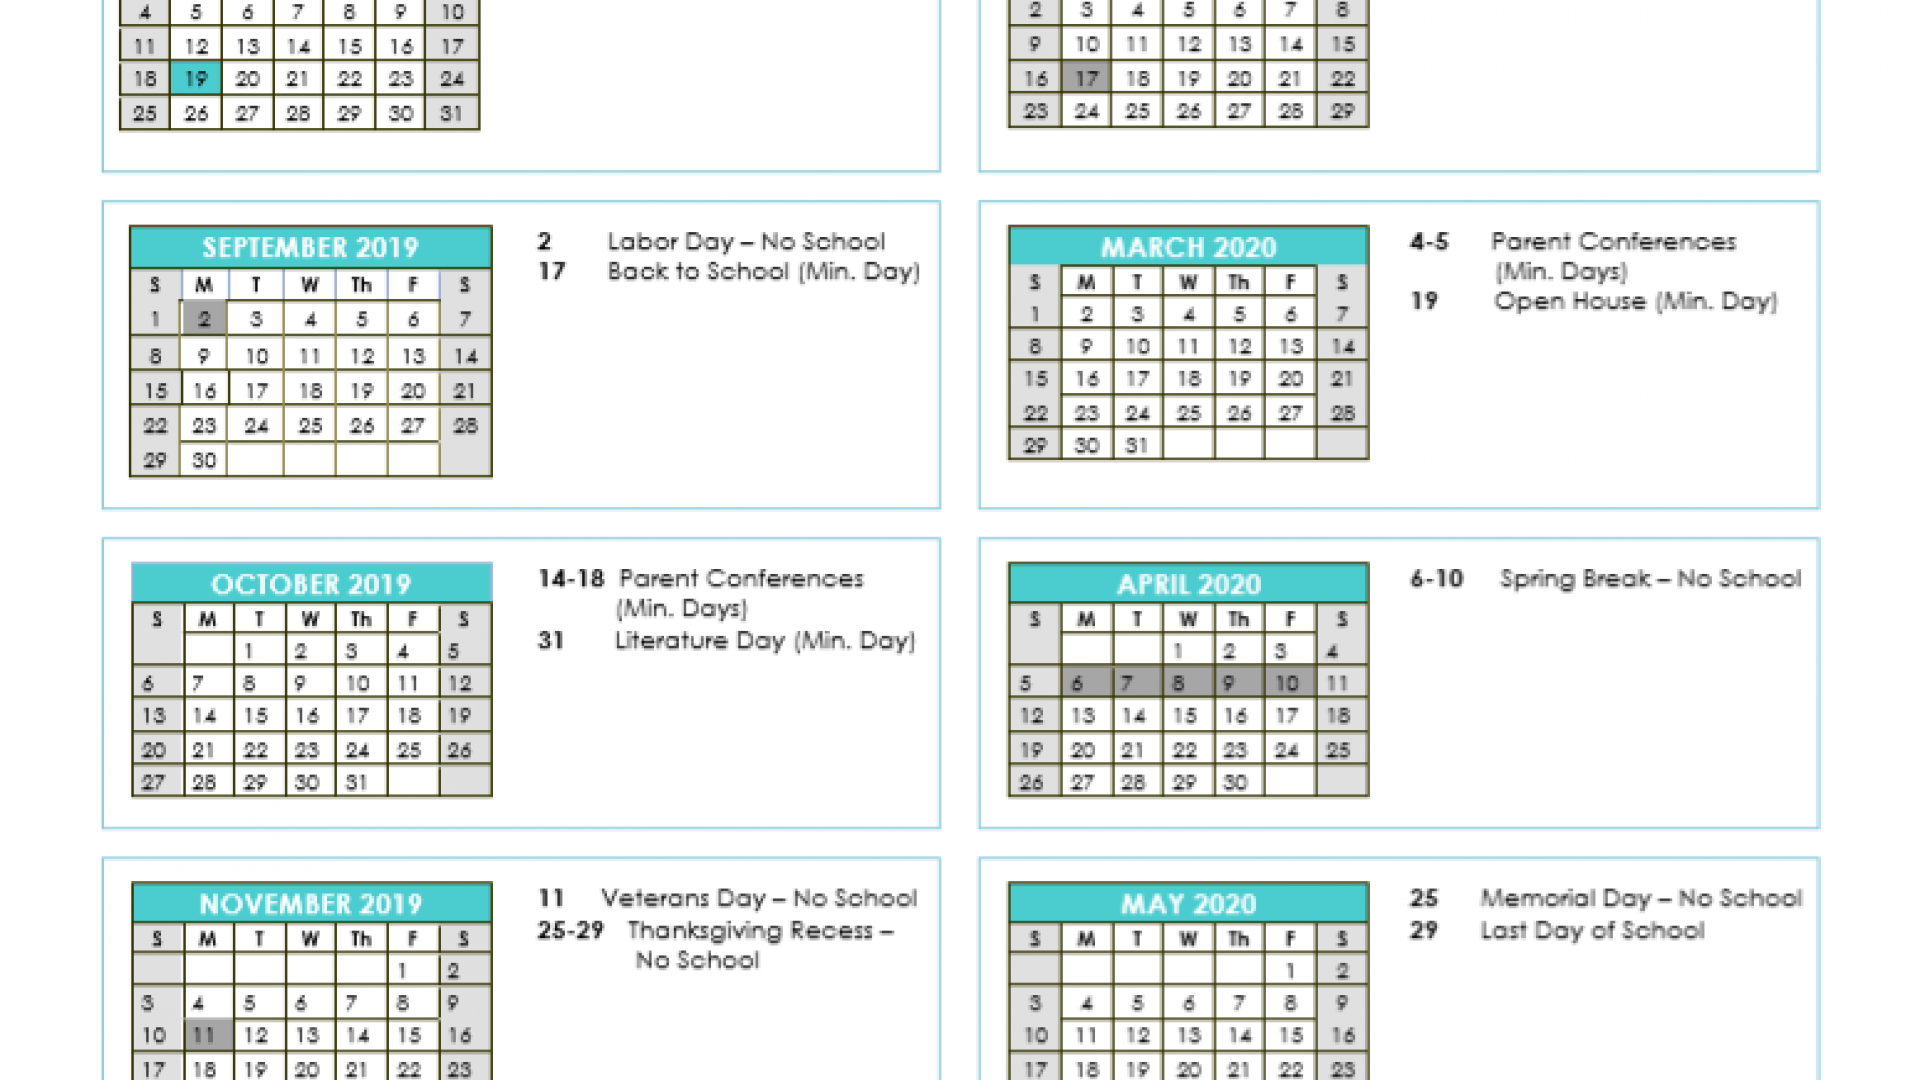 2019-2020 Spcs Oceanside School Calendar - Oceanside with regard to Oceanside Unified School District Calendar